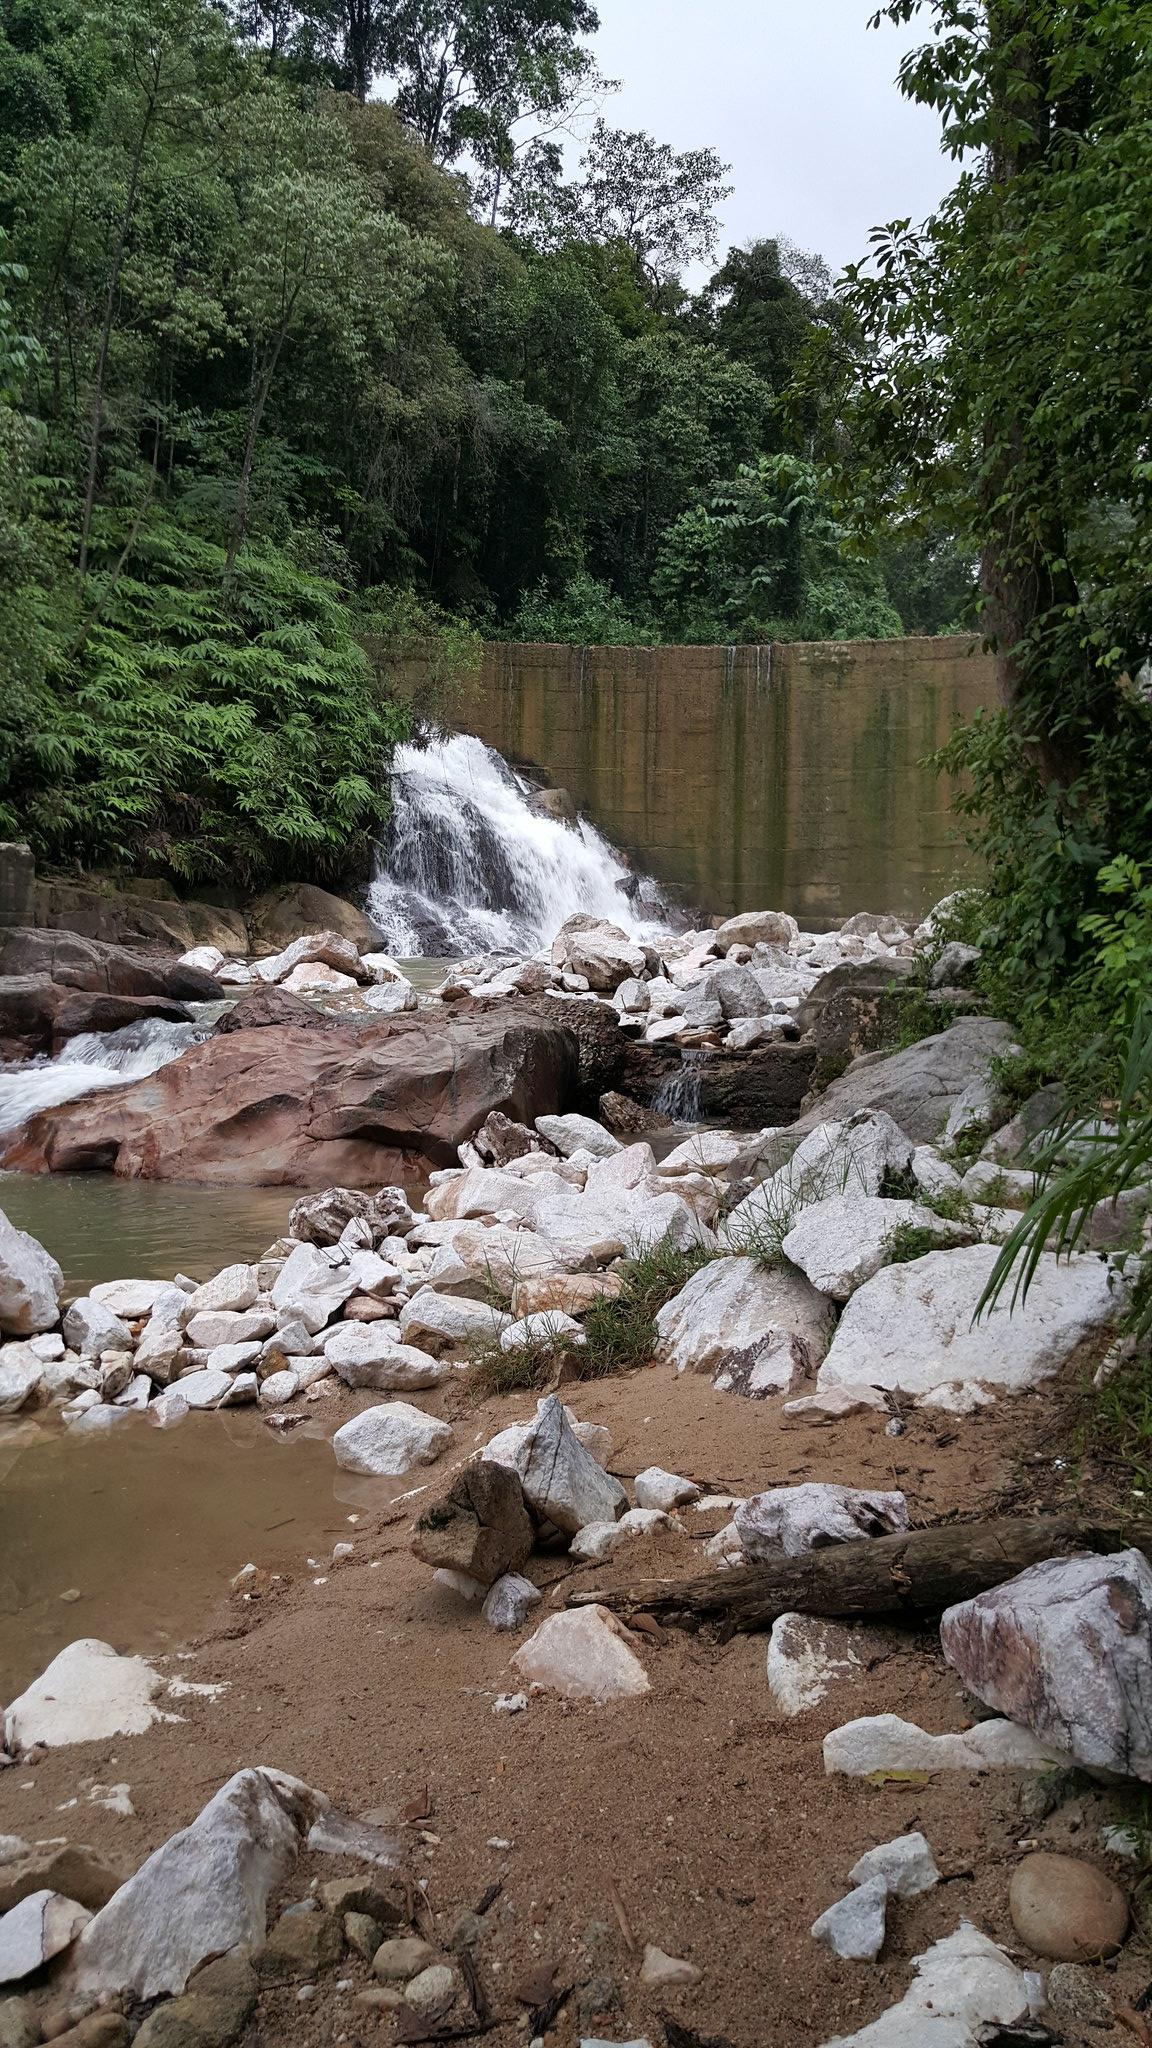 Daisybutter - Hong Kong Lifestyle and Fashion Blog: Daisybutter Travels, Malaysia, Kuala Lumpur, Ipoh, Ipoh natural hot springs